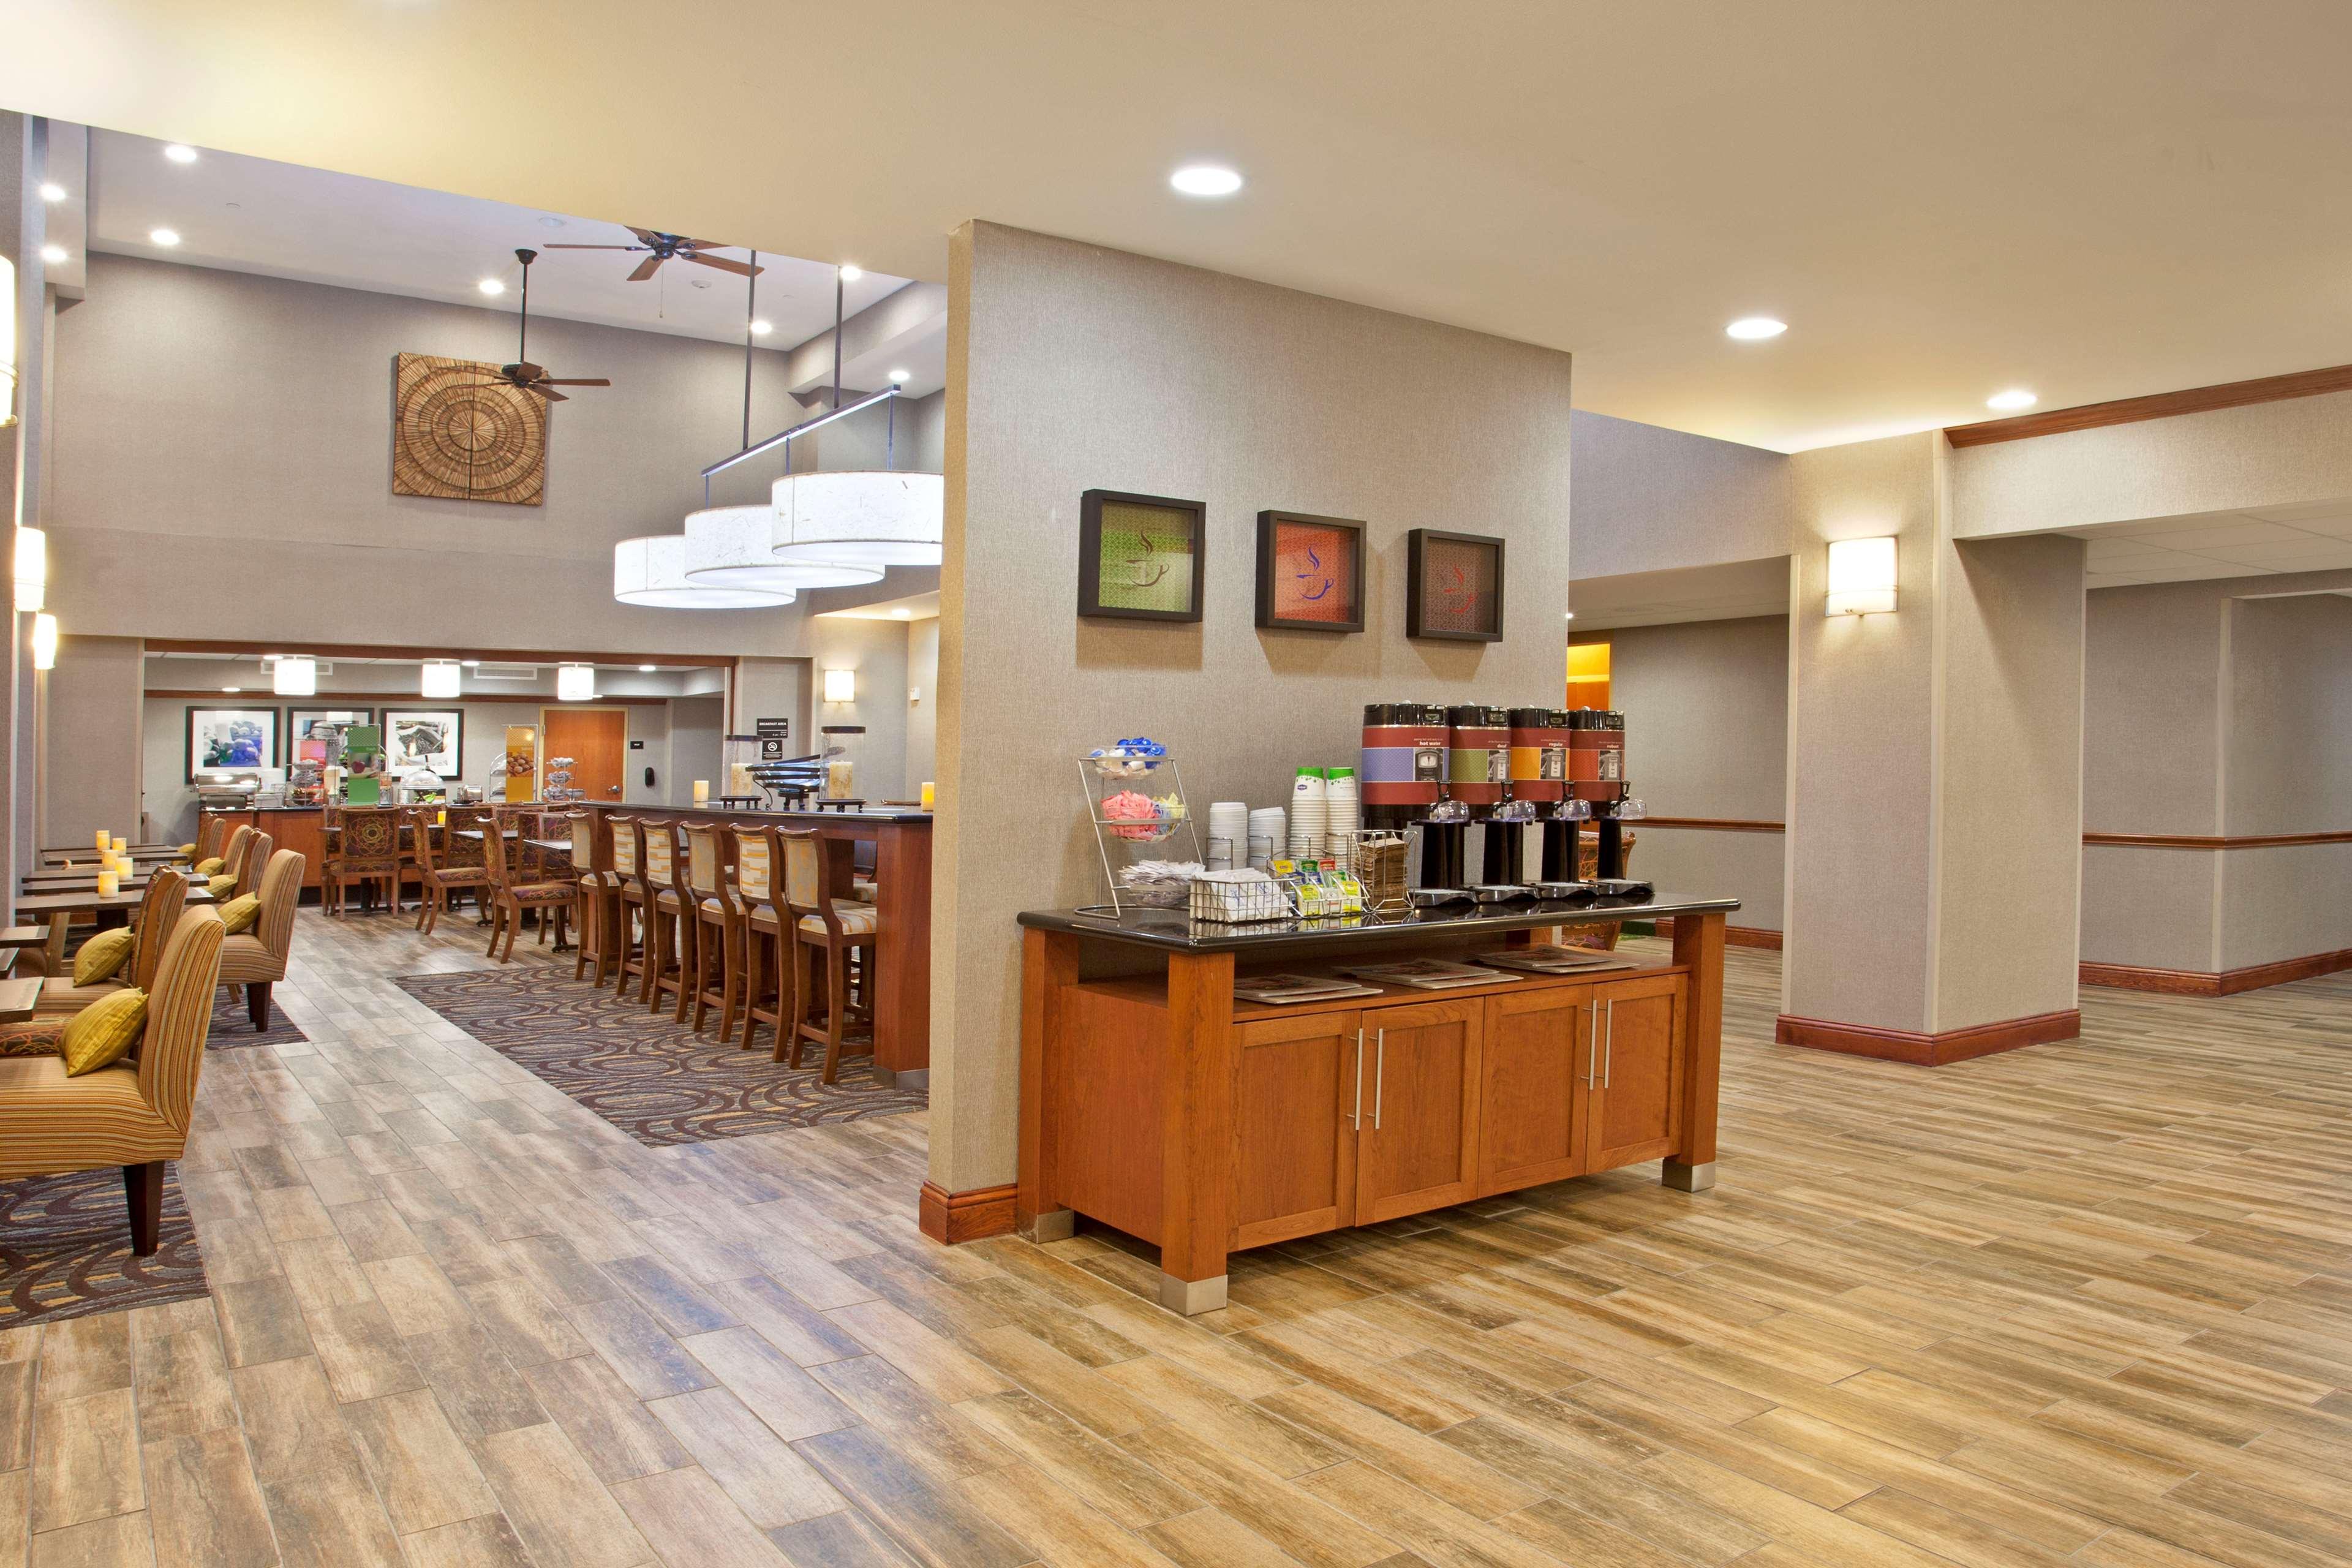 Hampton Inn & Suites Fort Worth-West-I-30 image 5